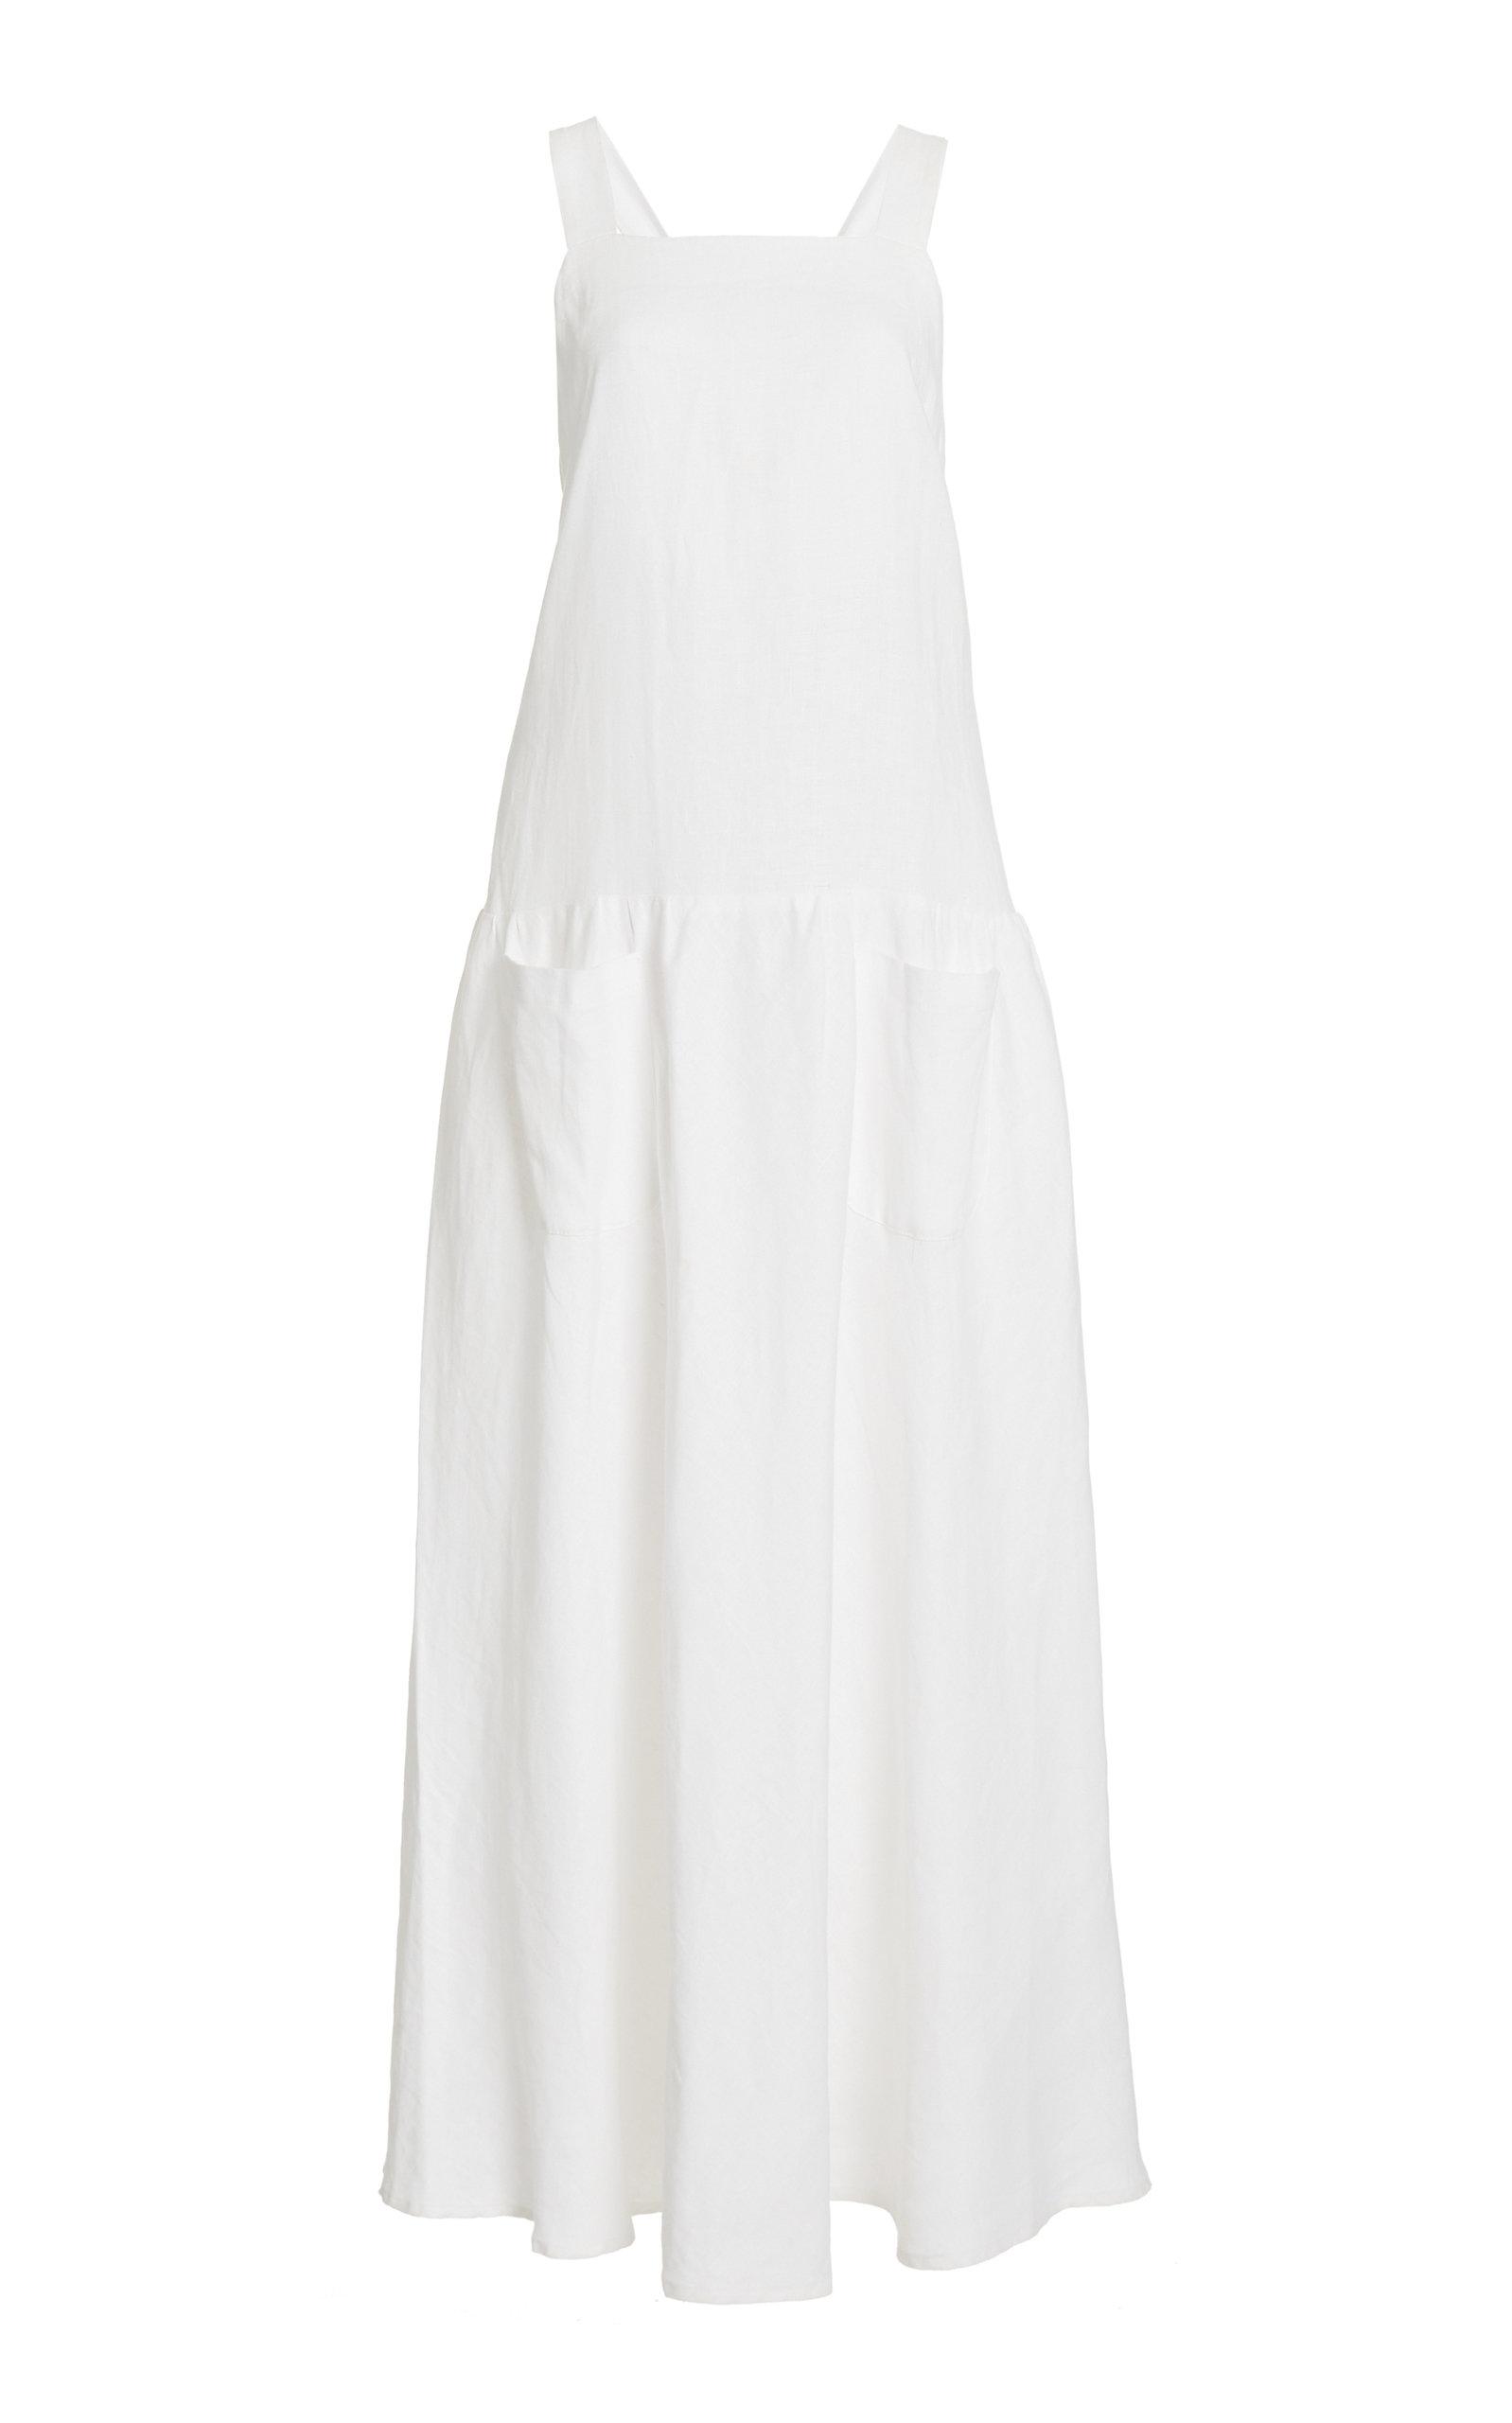 Women's Linen Apron Maxi Dress